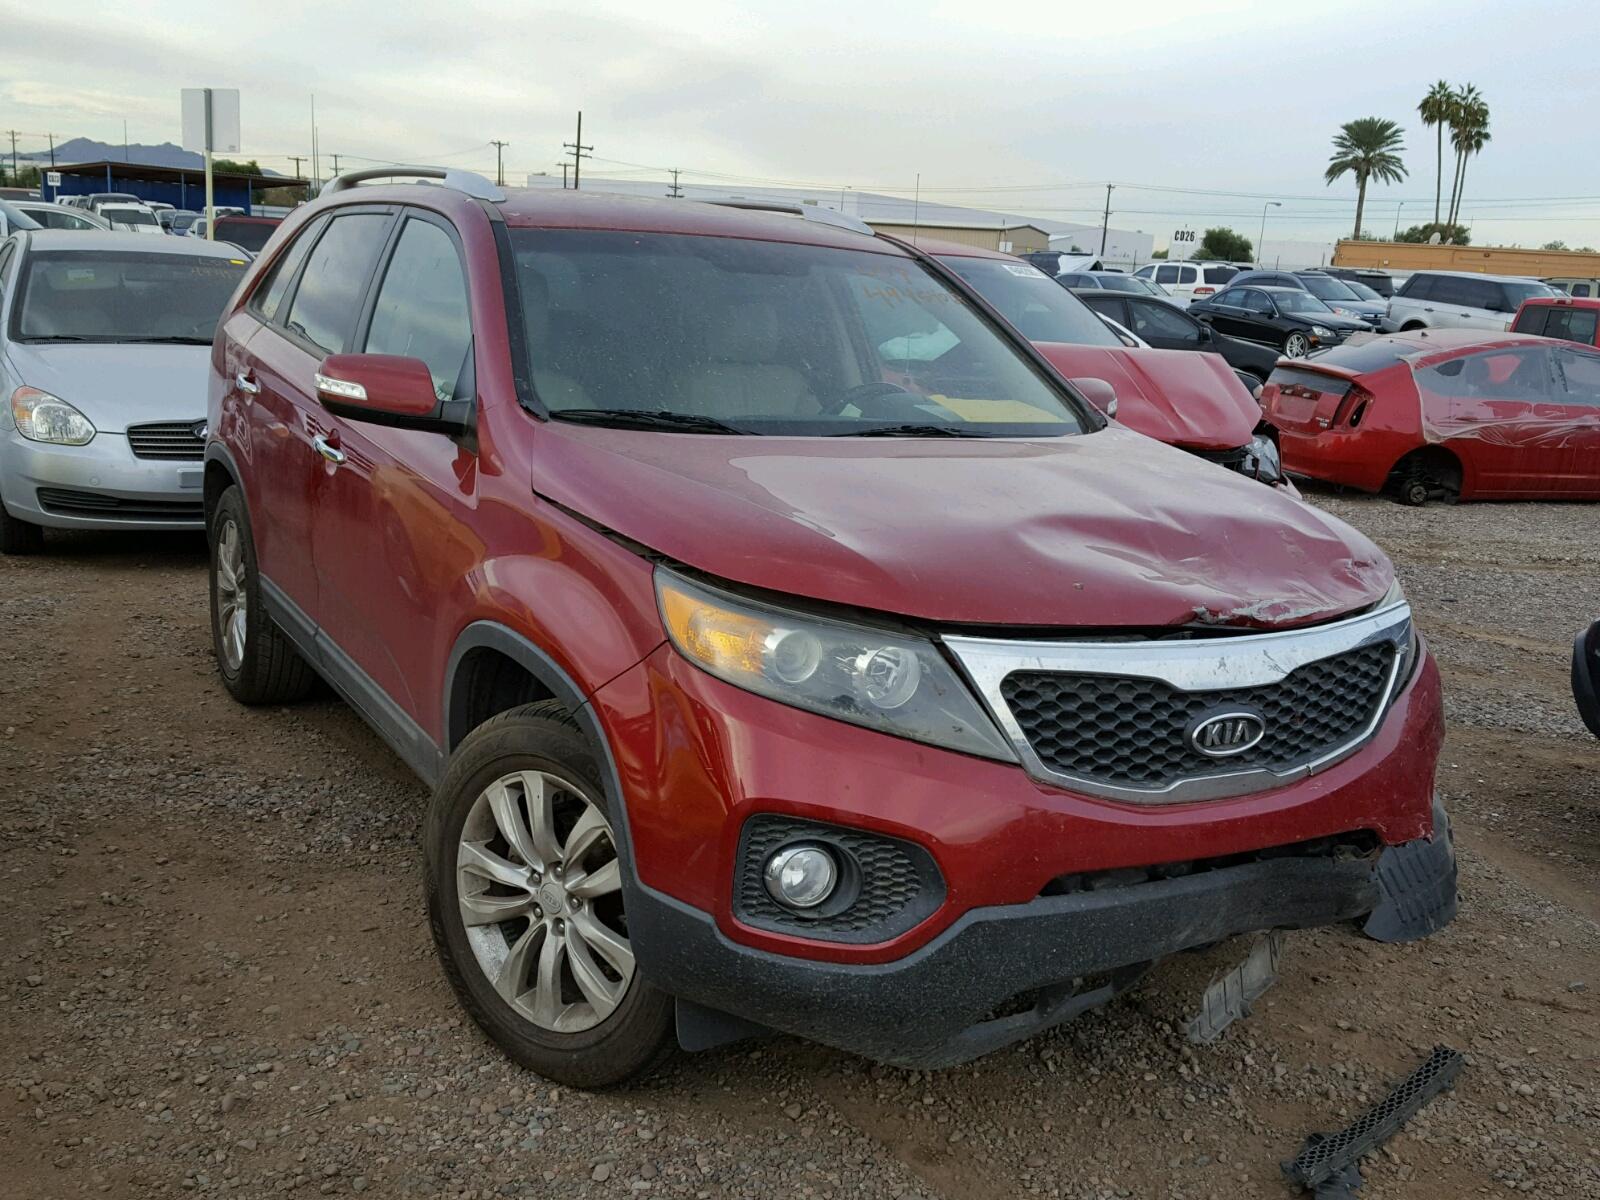 baton optima rouge and img in kia for cars of la used sale new com auto